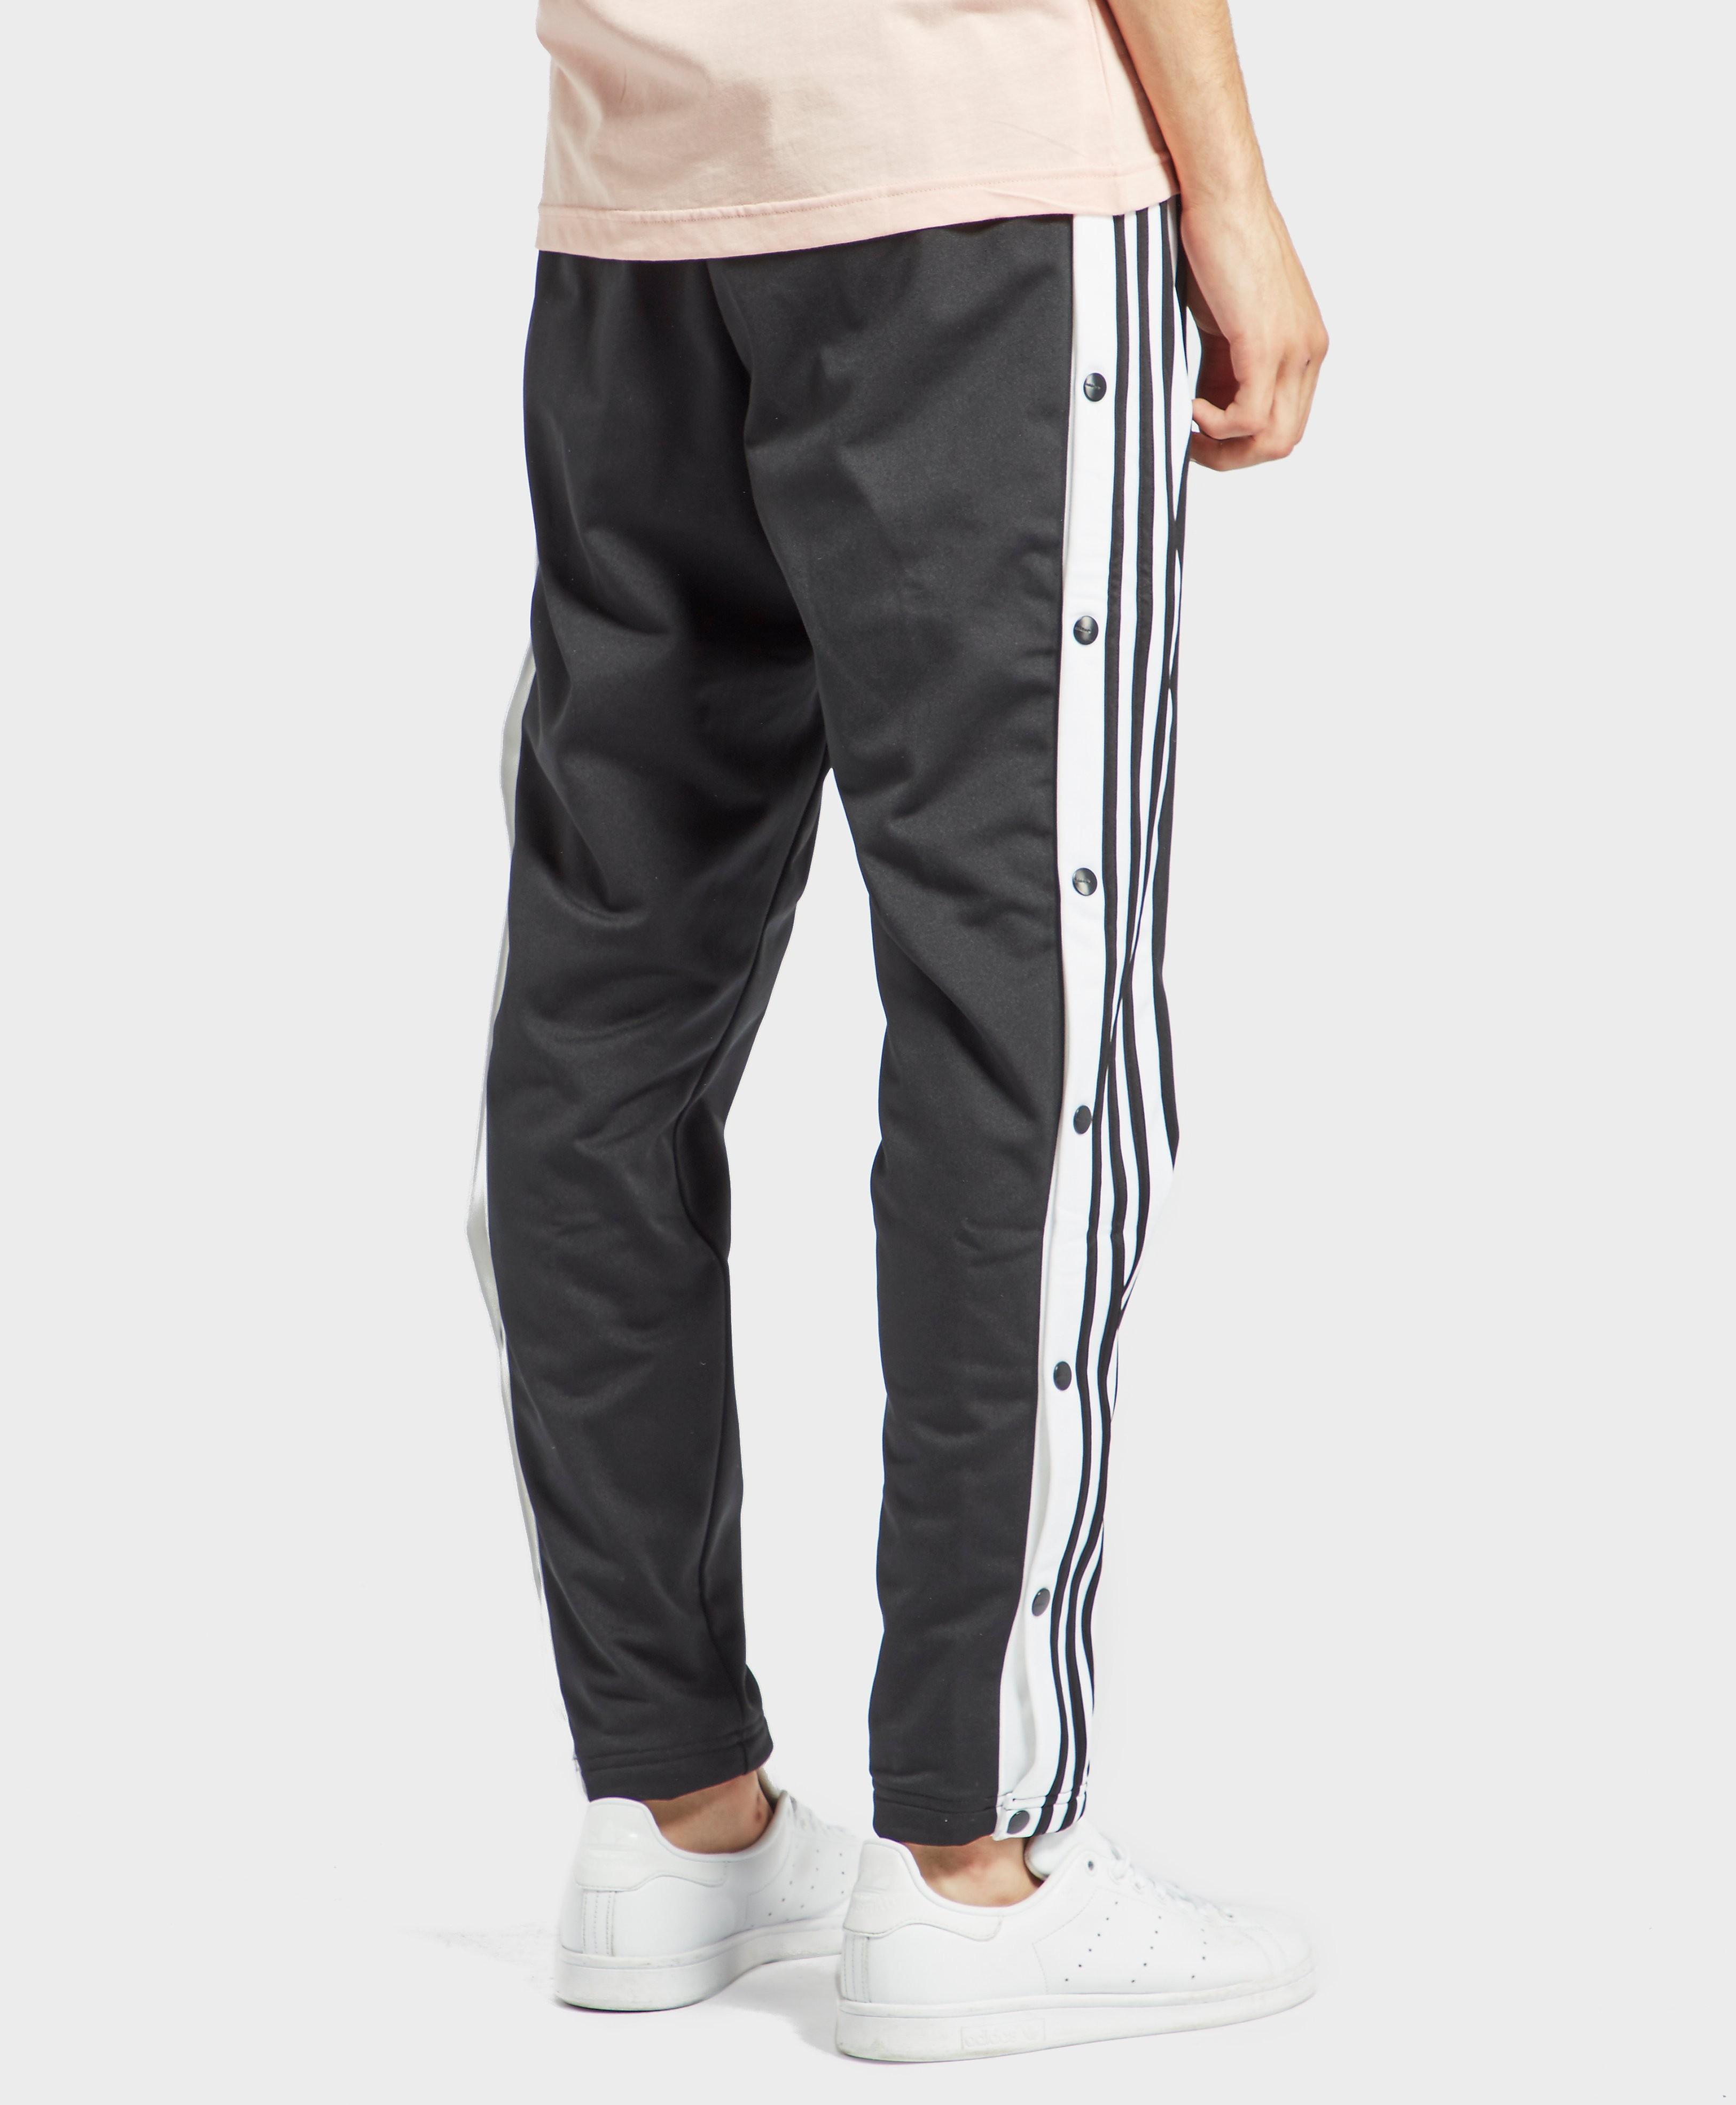 adidas Originals Adibreak Popper Track Pants